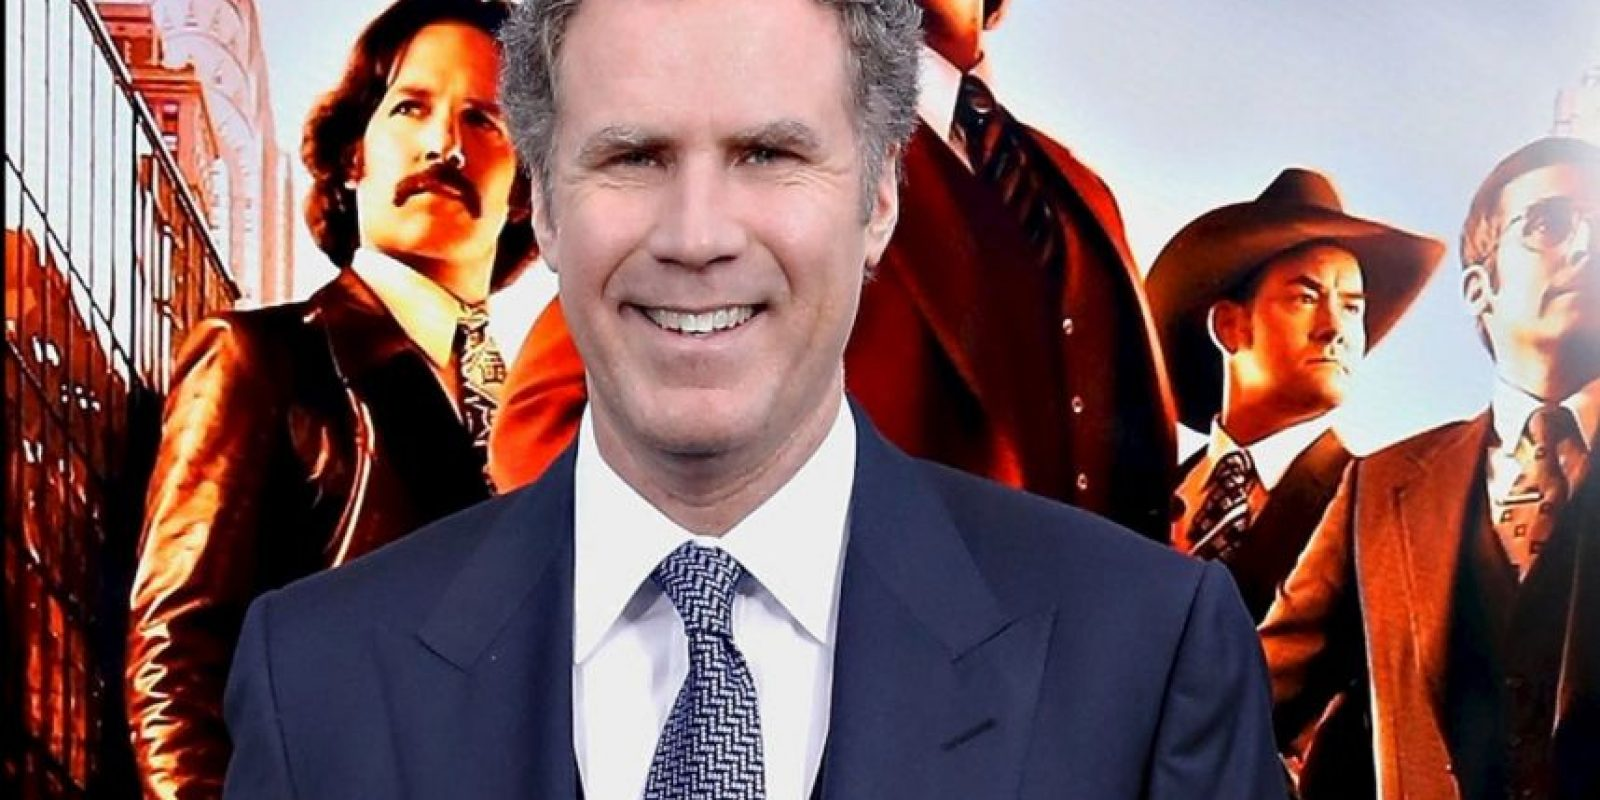 Alguien que hace reír mucho: Will Ferrell. Foto:Getty Images